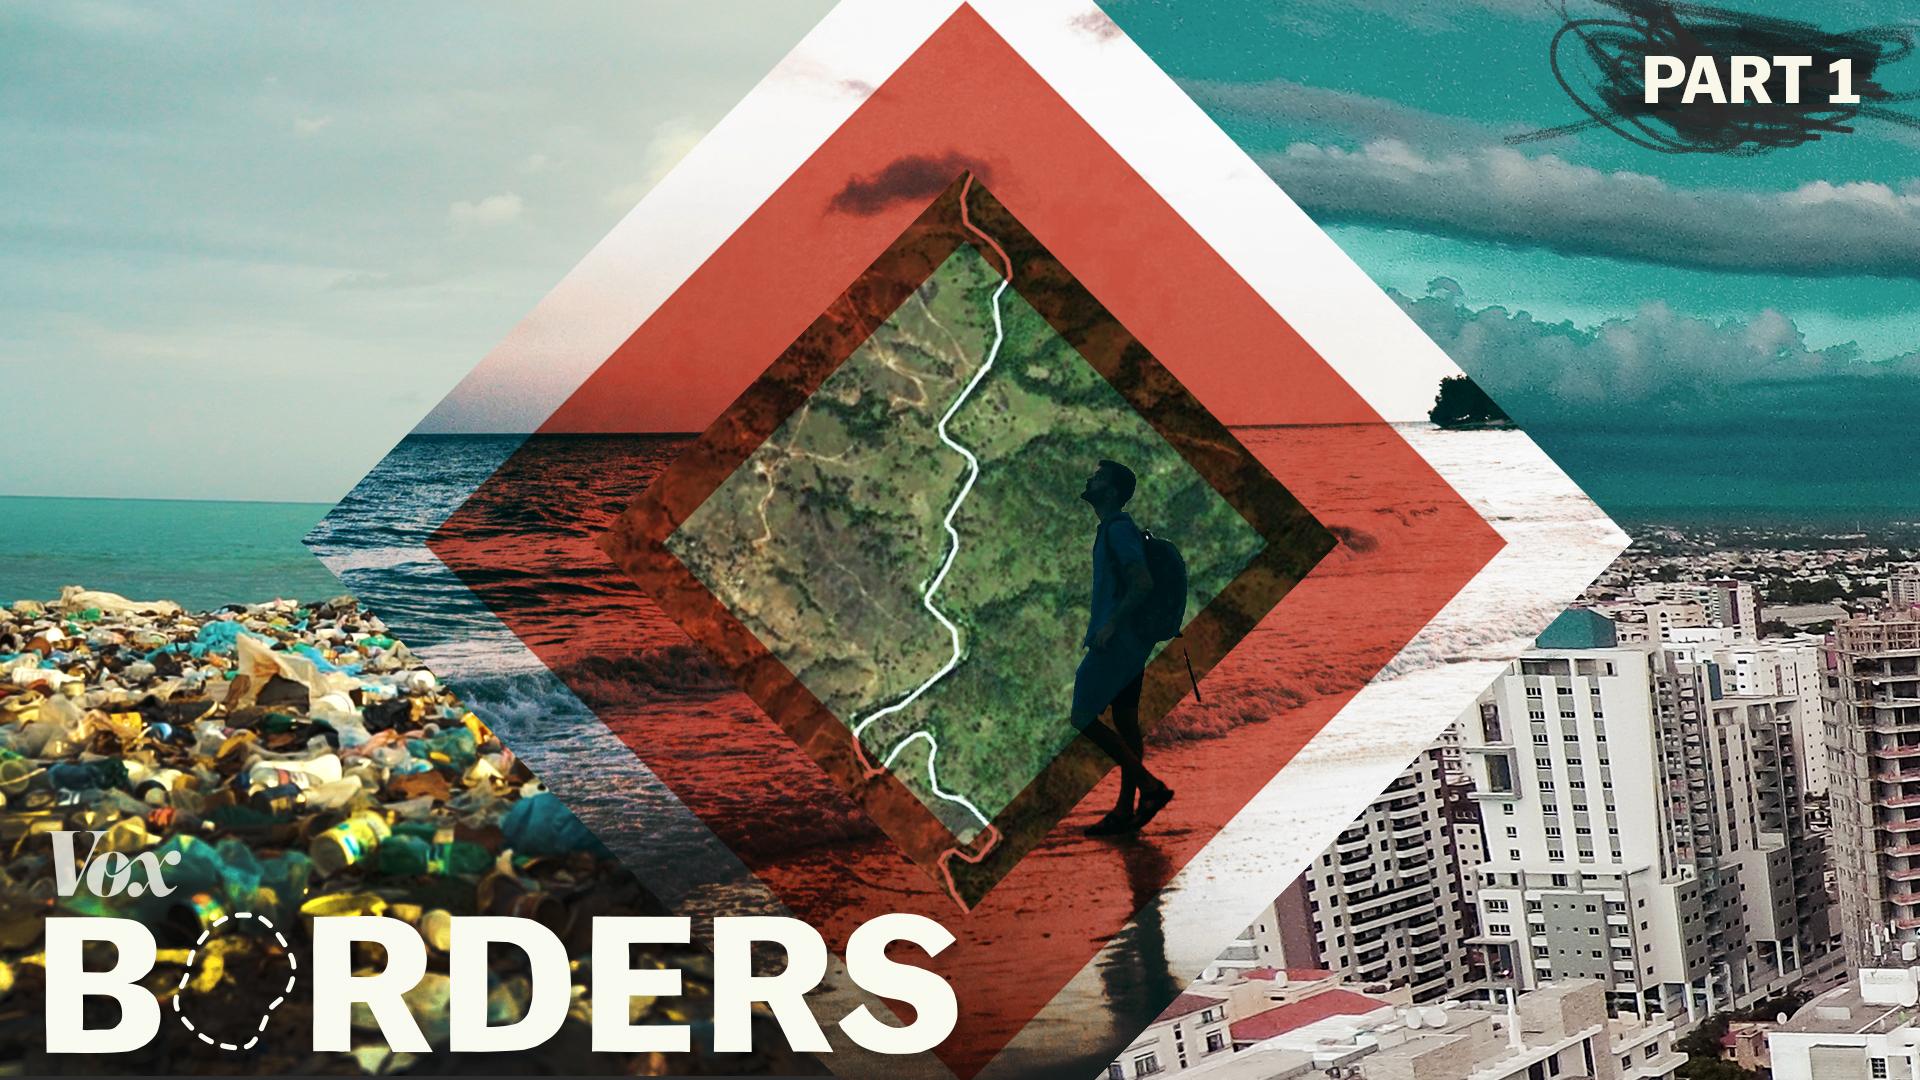 Vox Borders Episode One